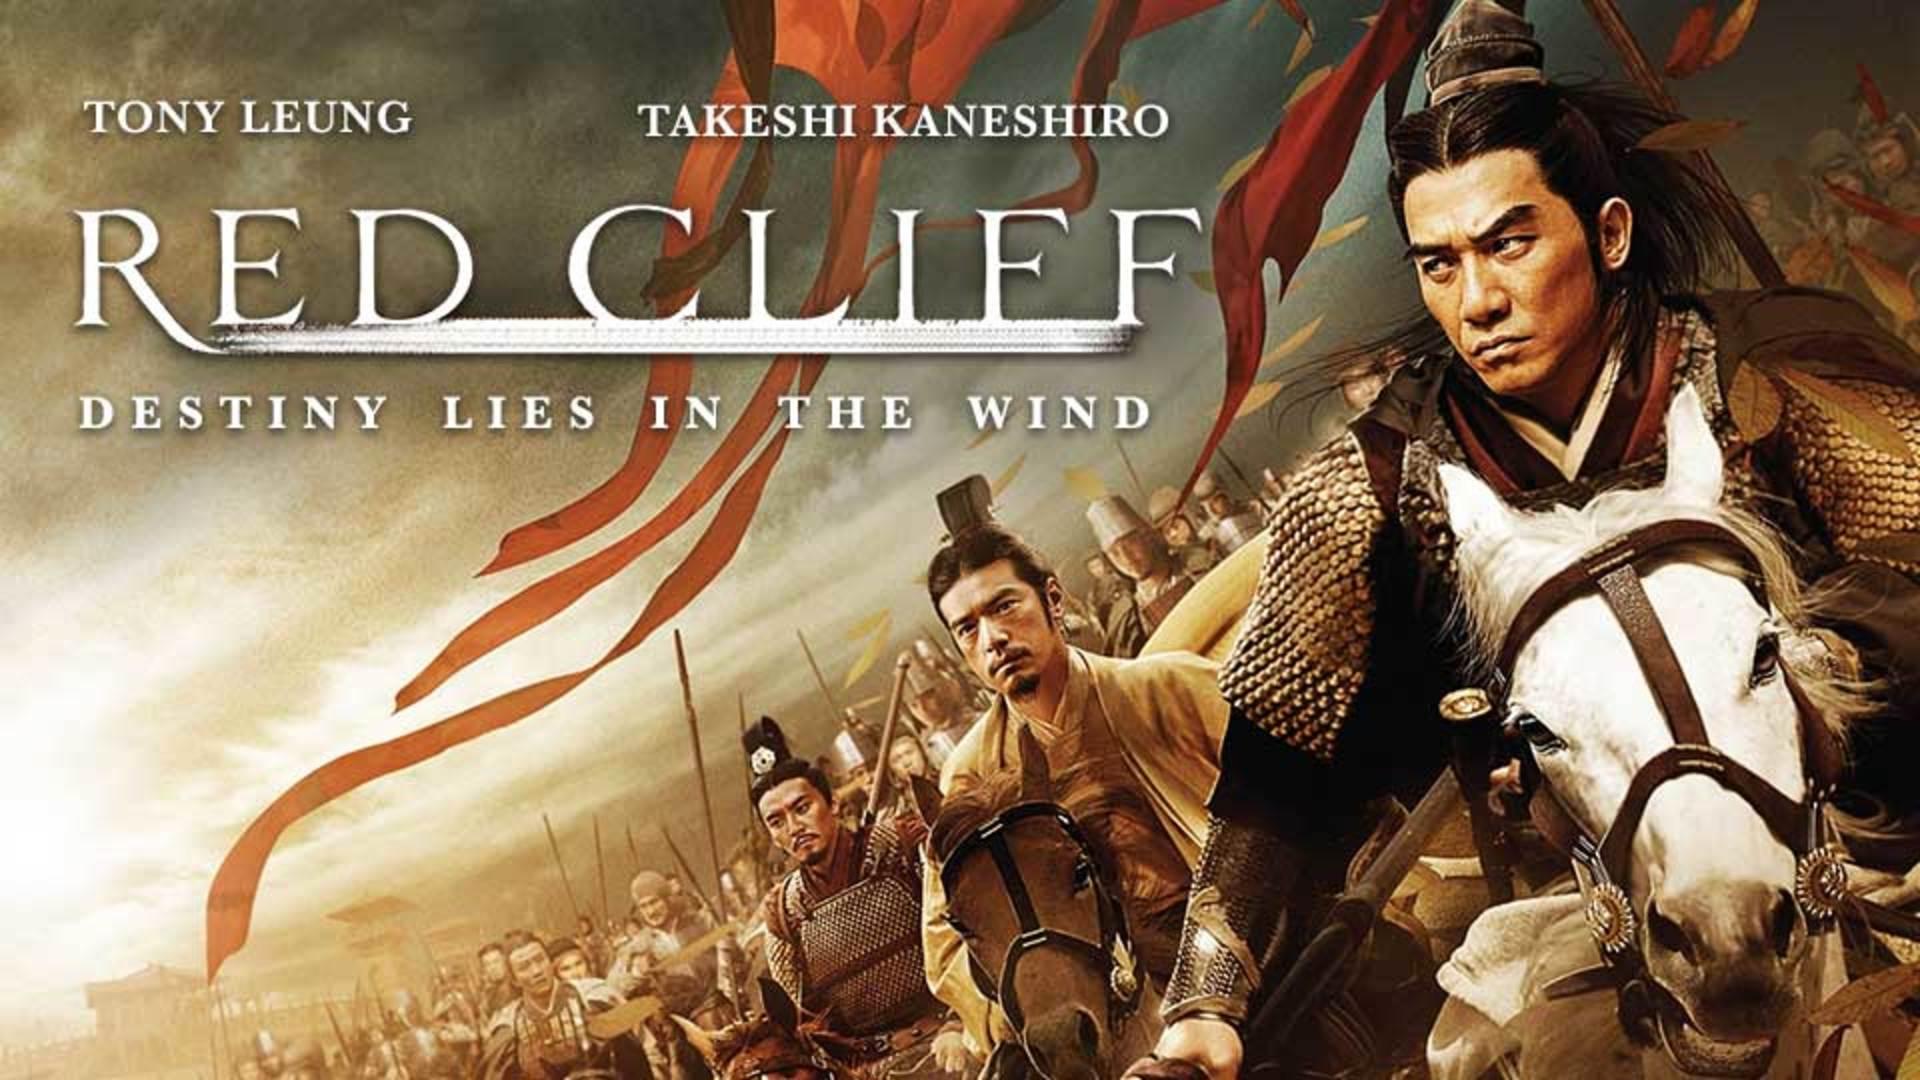 Familinia - Red Cliff (2008)